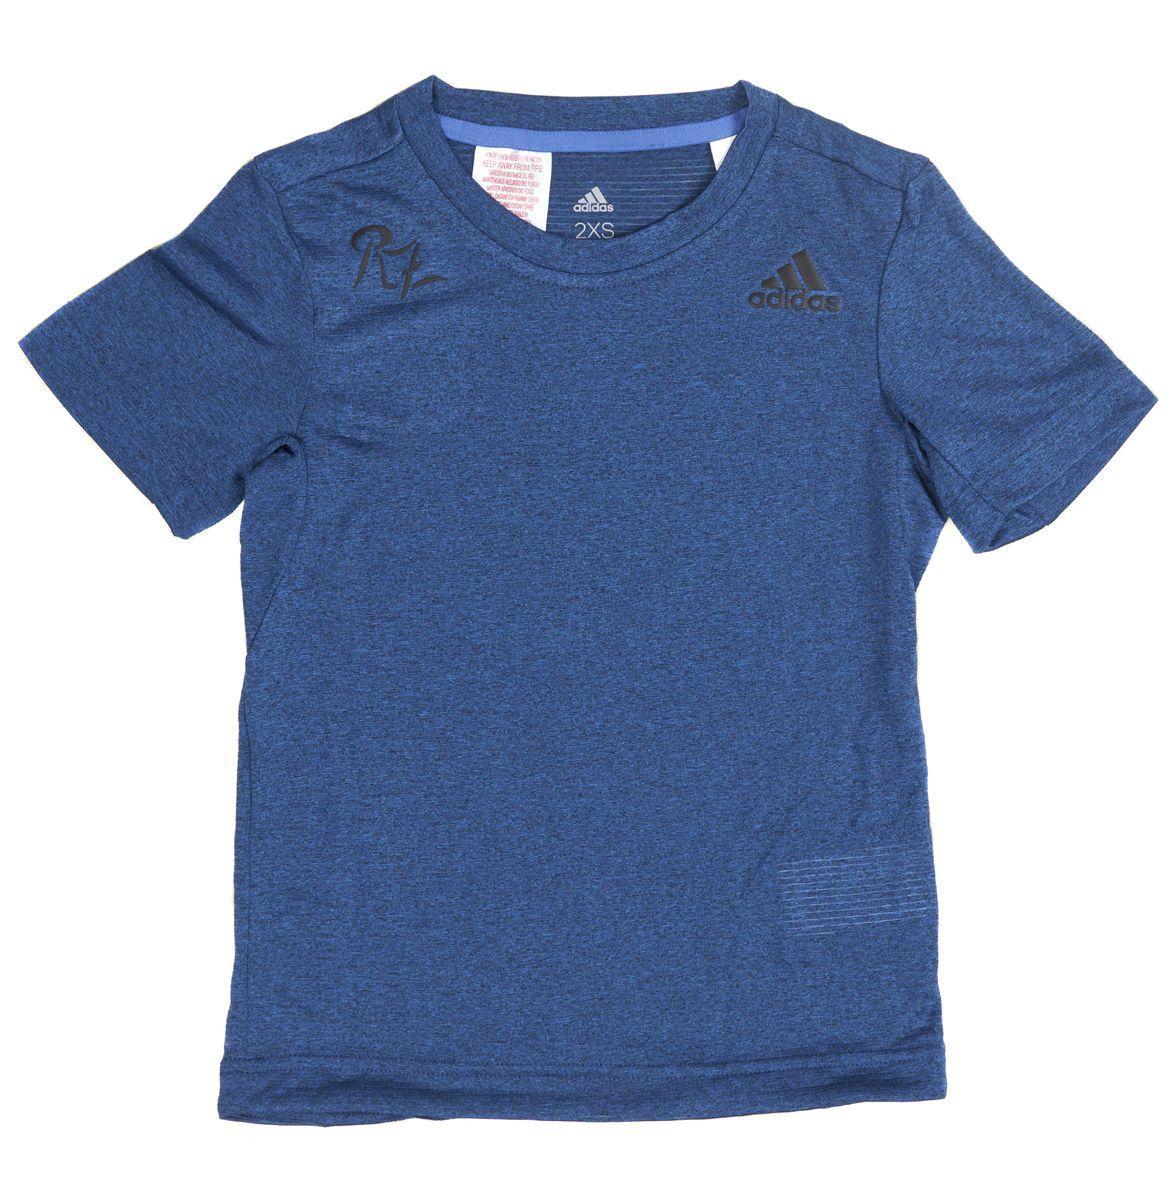 Camiseta técnica infantil